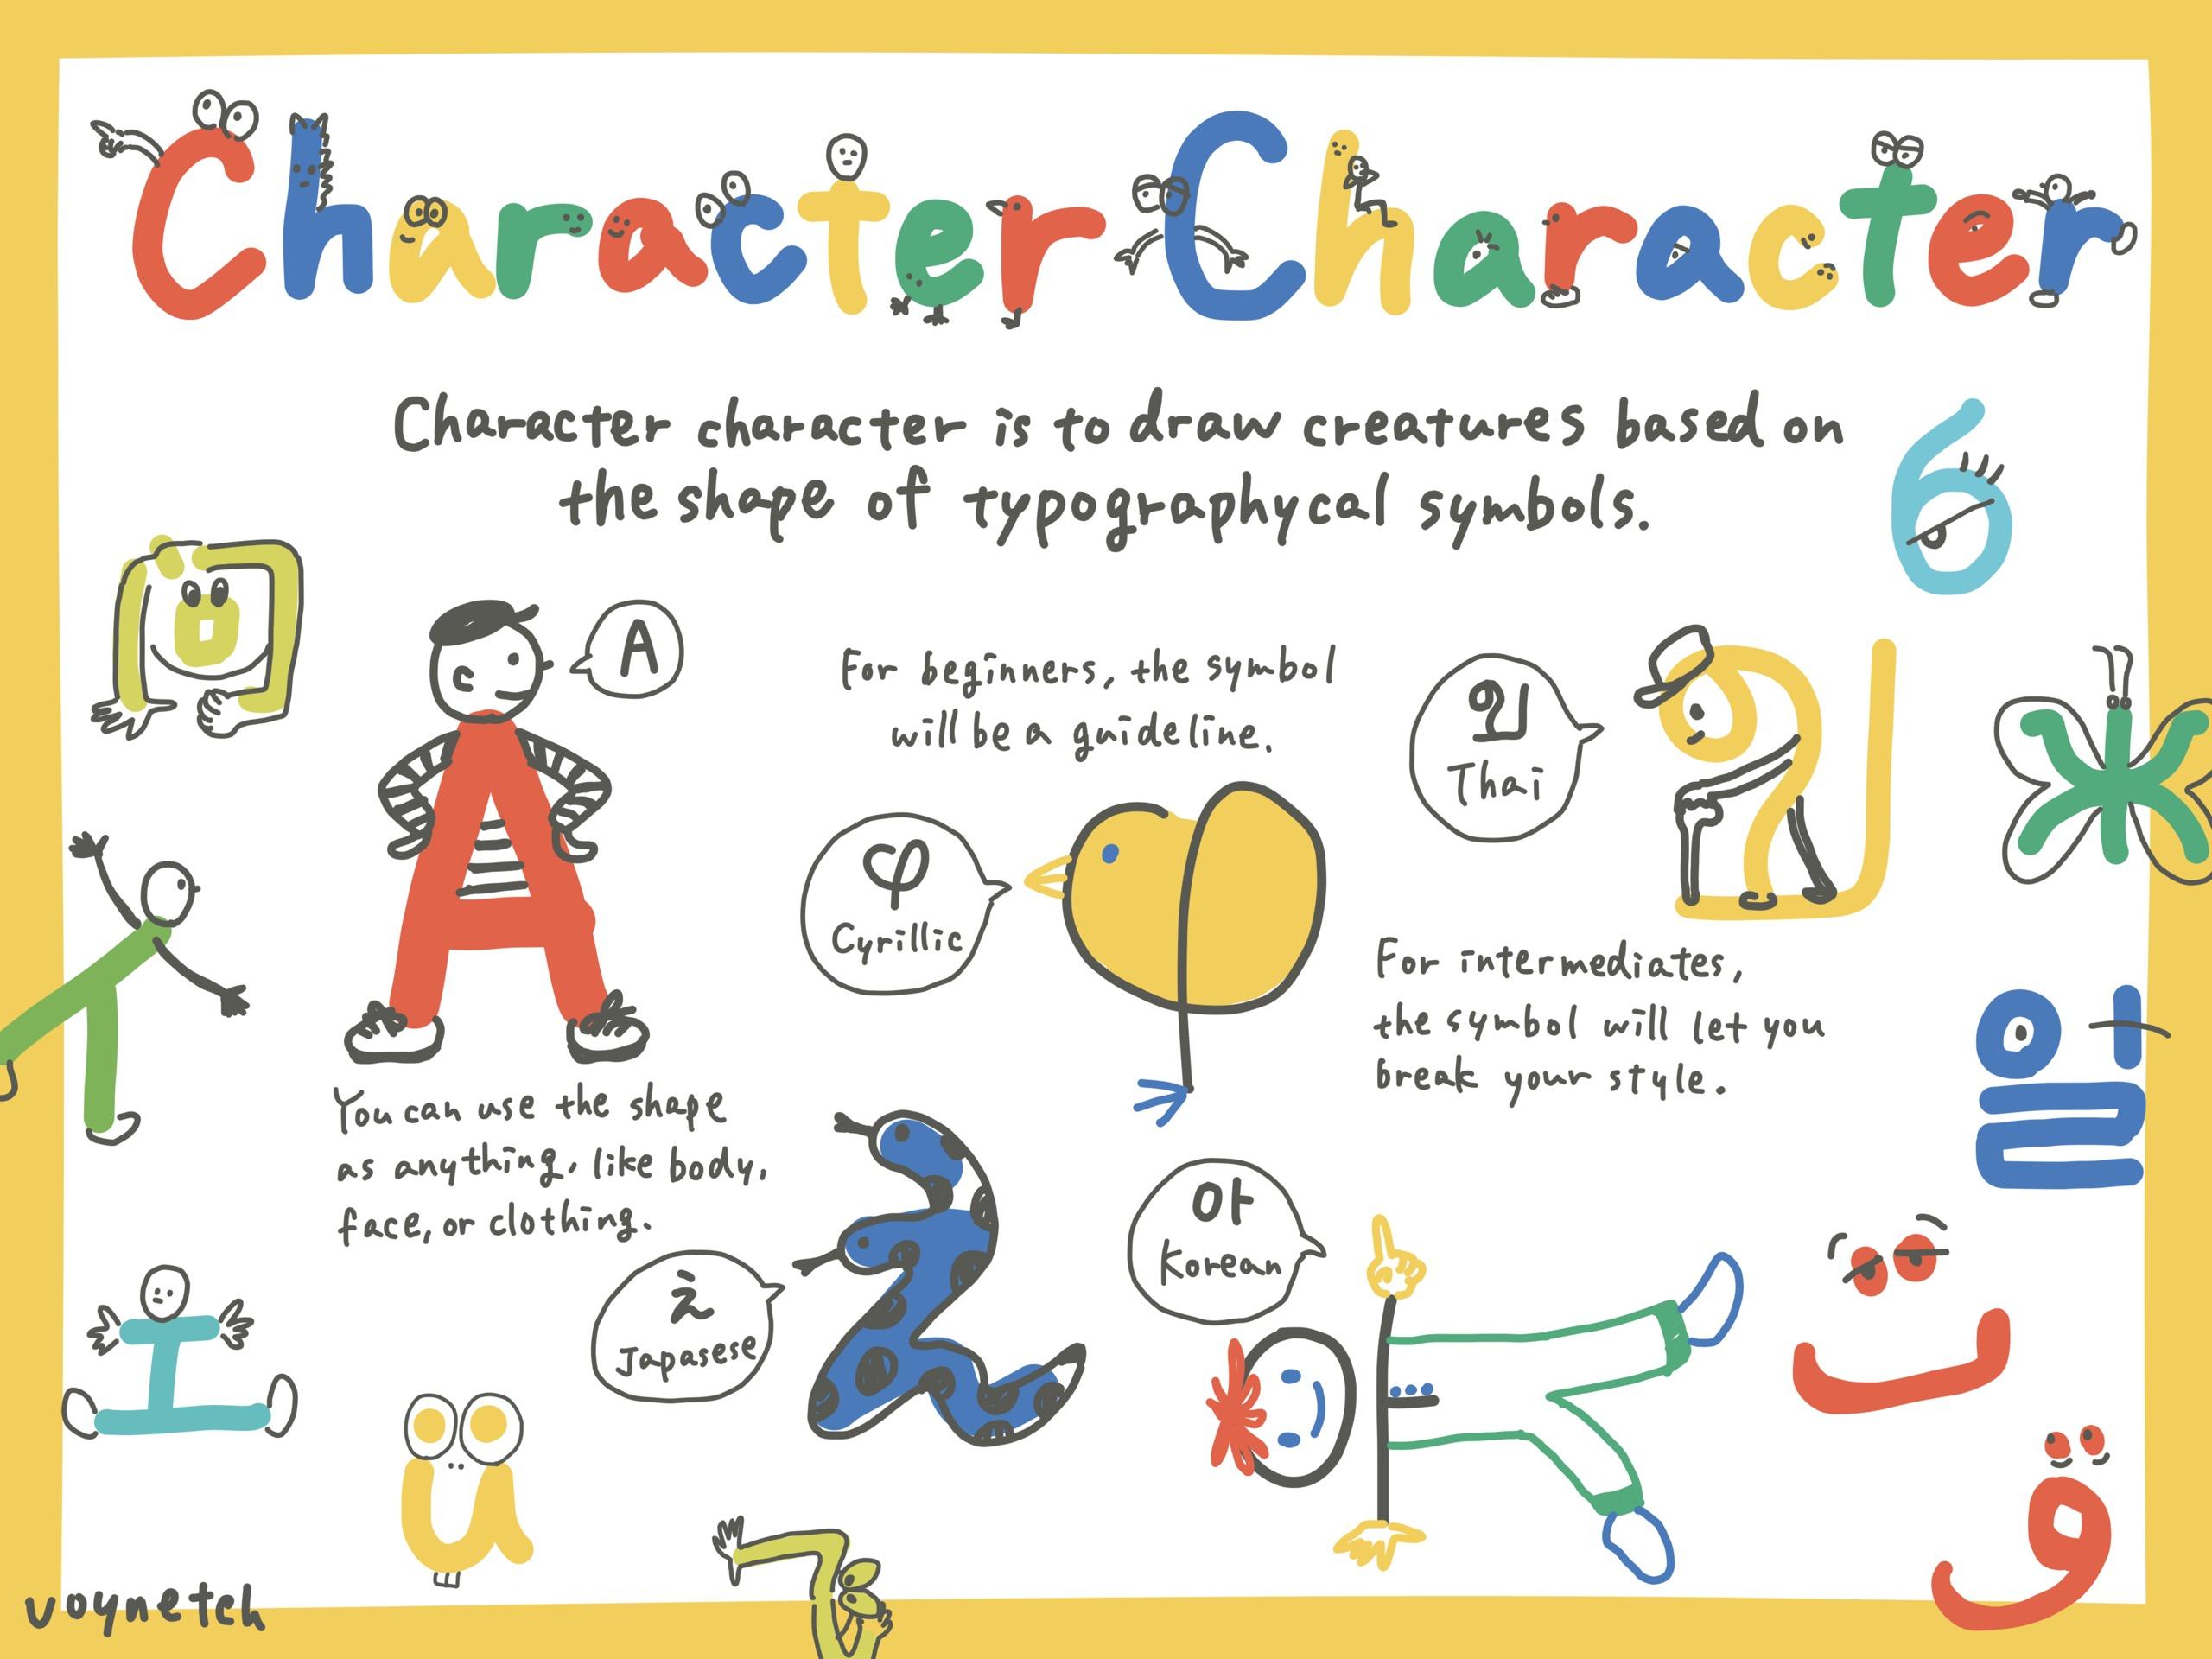 Character character Image (1/3)